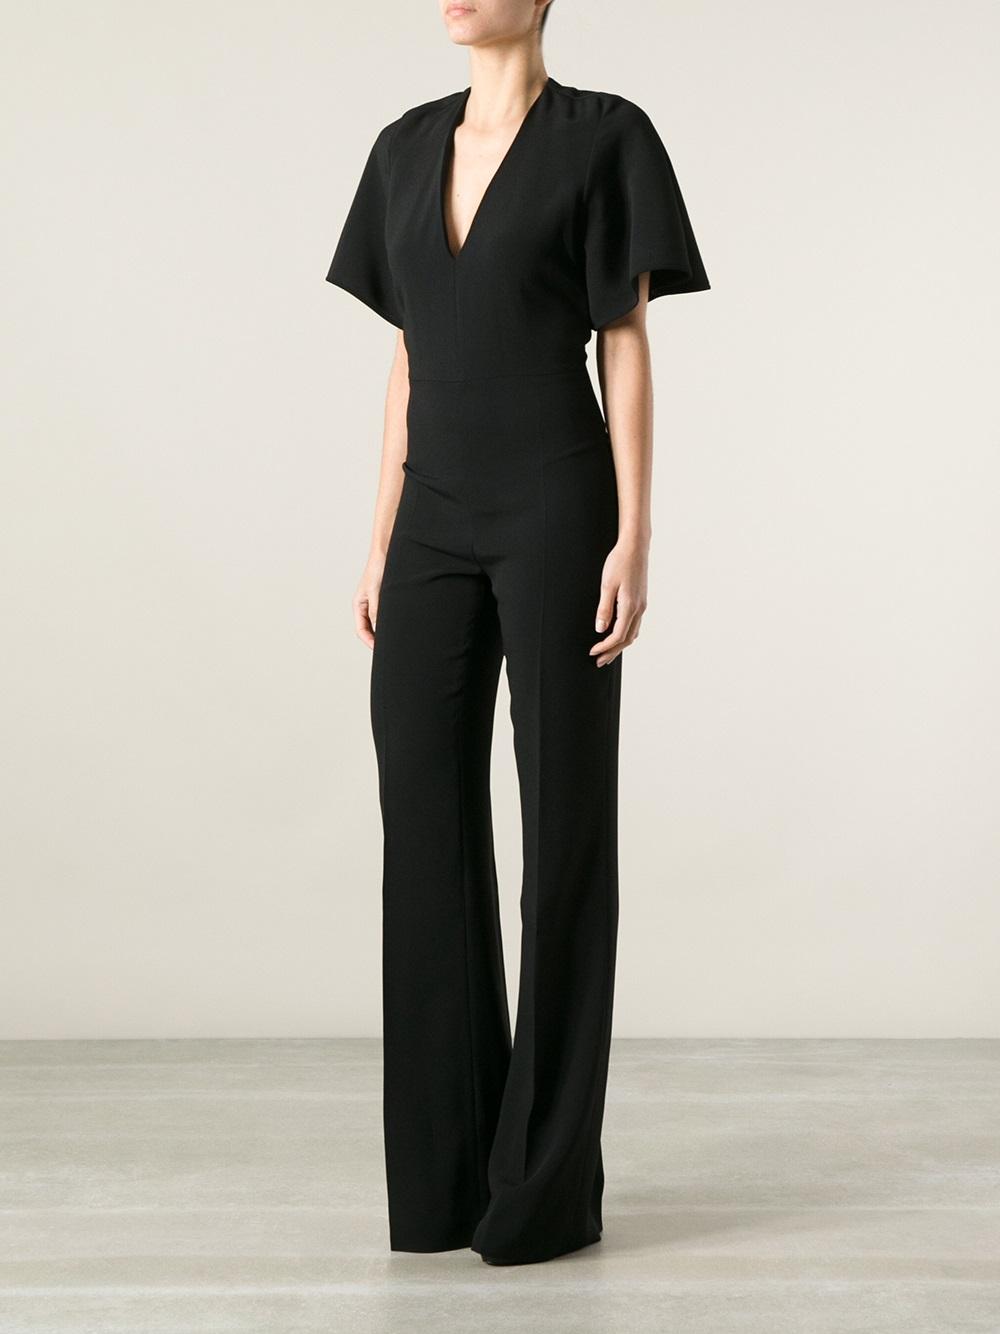 Stella Mccartney Flared Trouser Jumpsuit - Nida - Farfetch.com